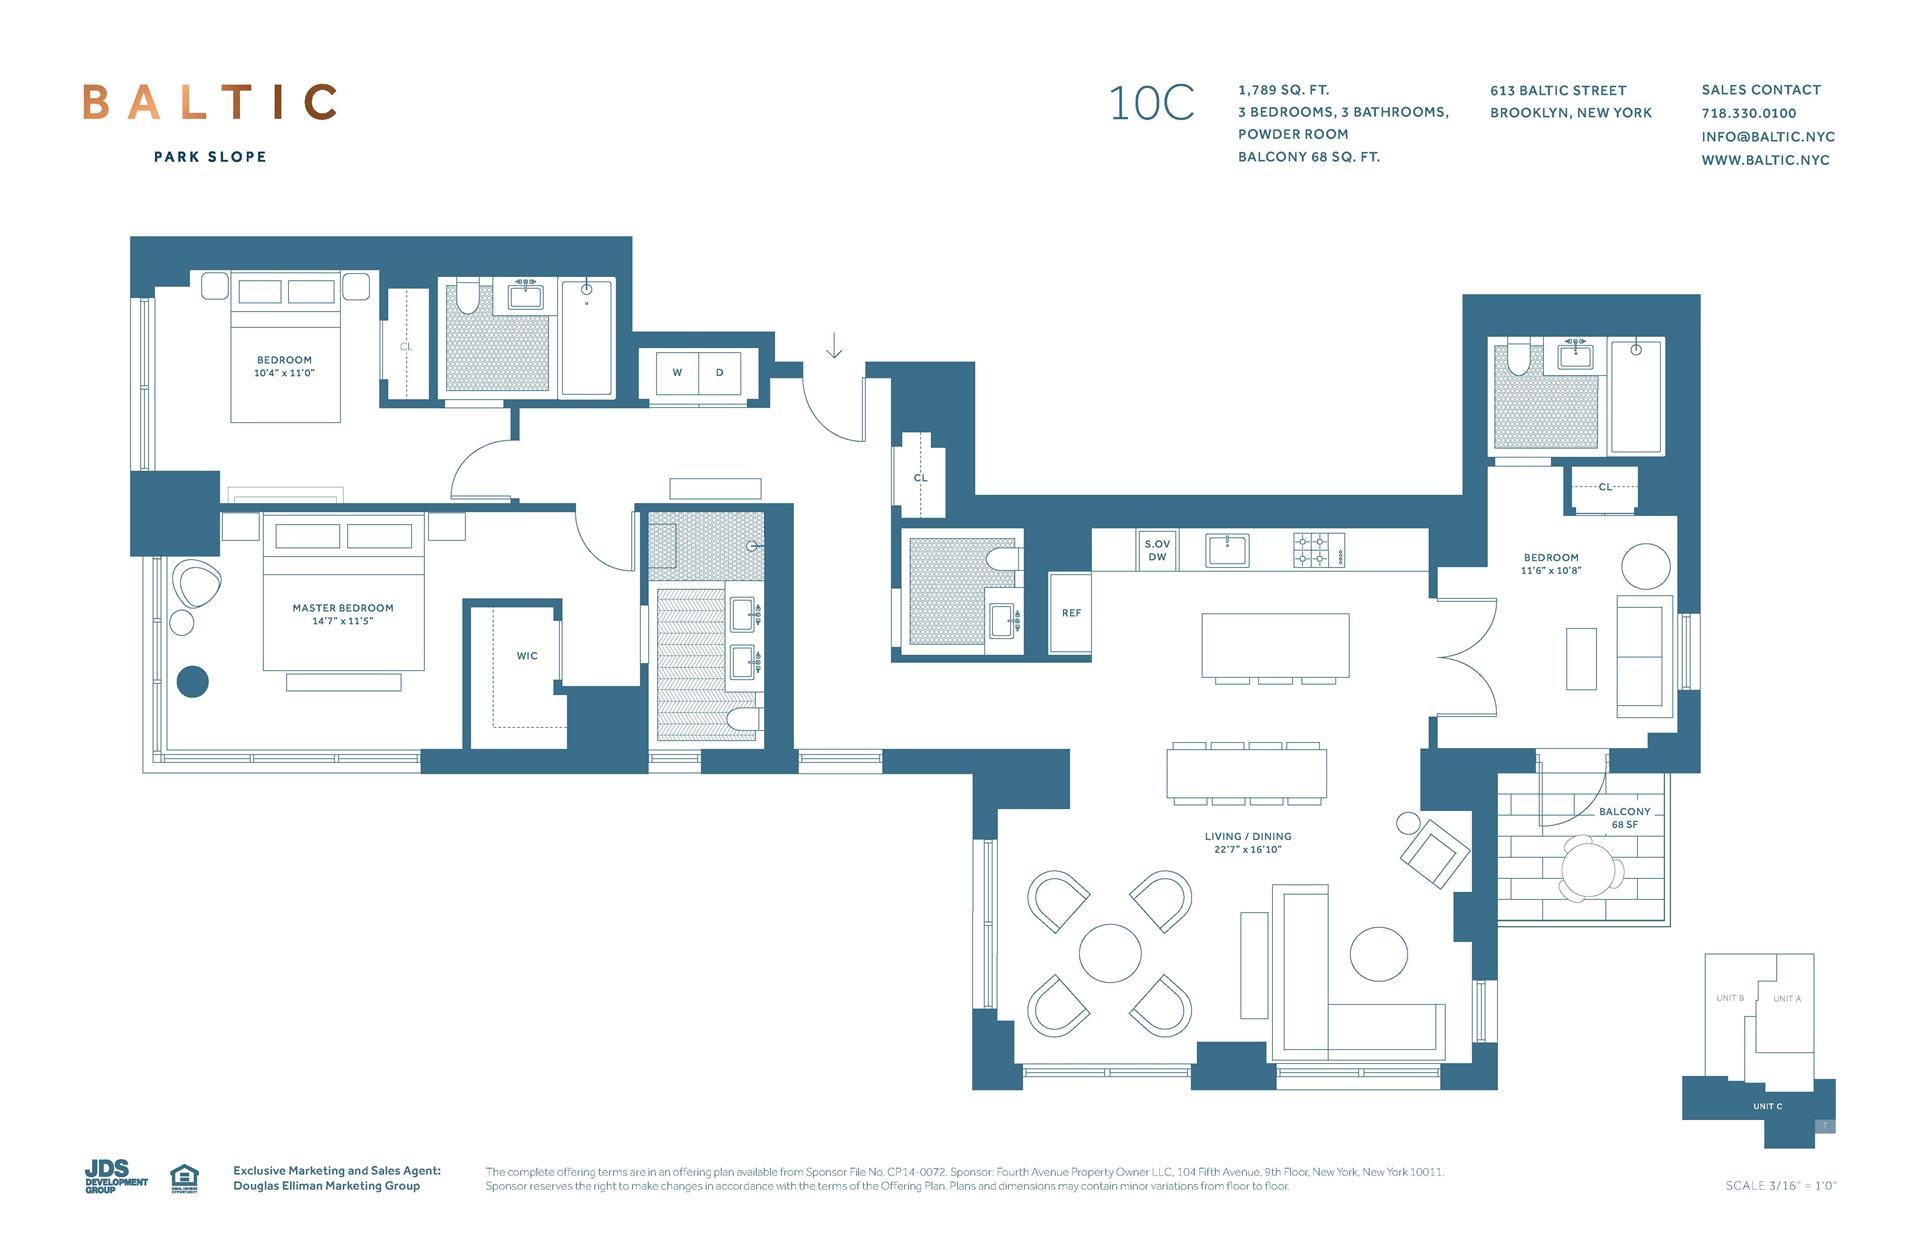 Floor plan of 613 Baltic St, 10C - Park Slope, New York